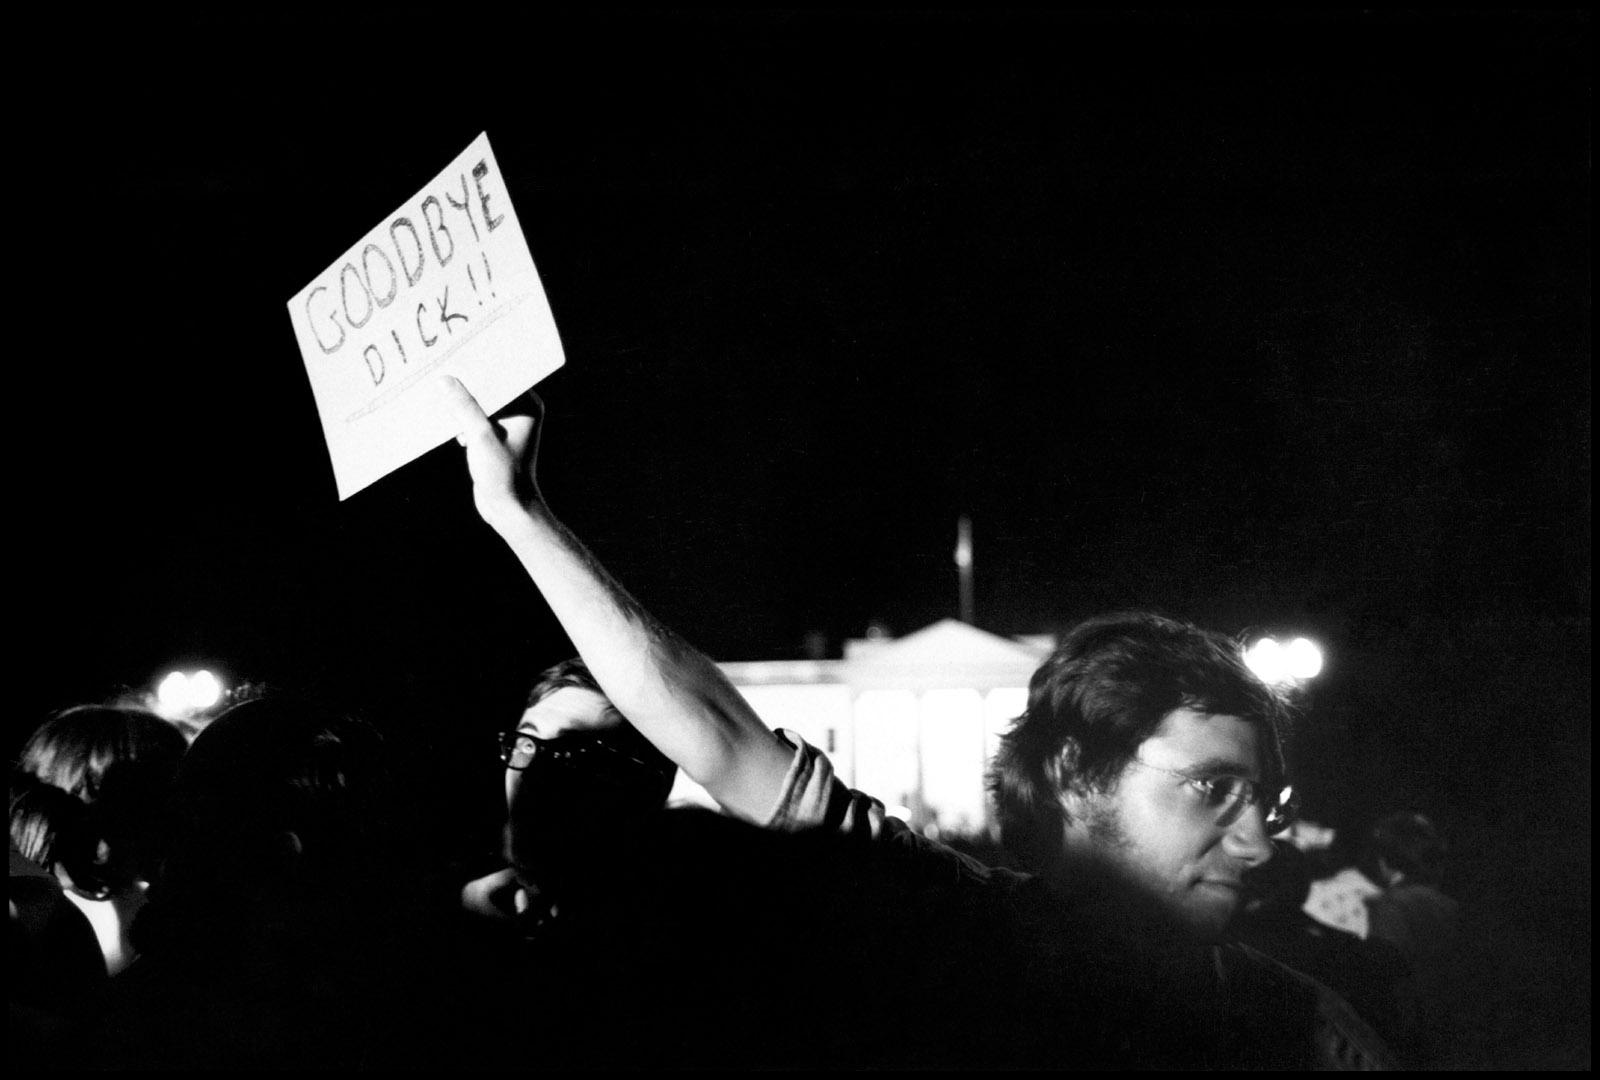 Demonstration outside White House on the night of Richard Nixon's resignation